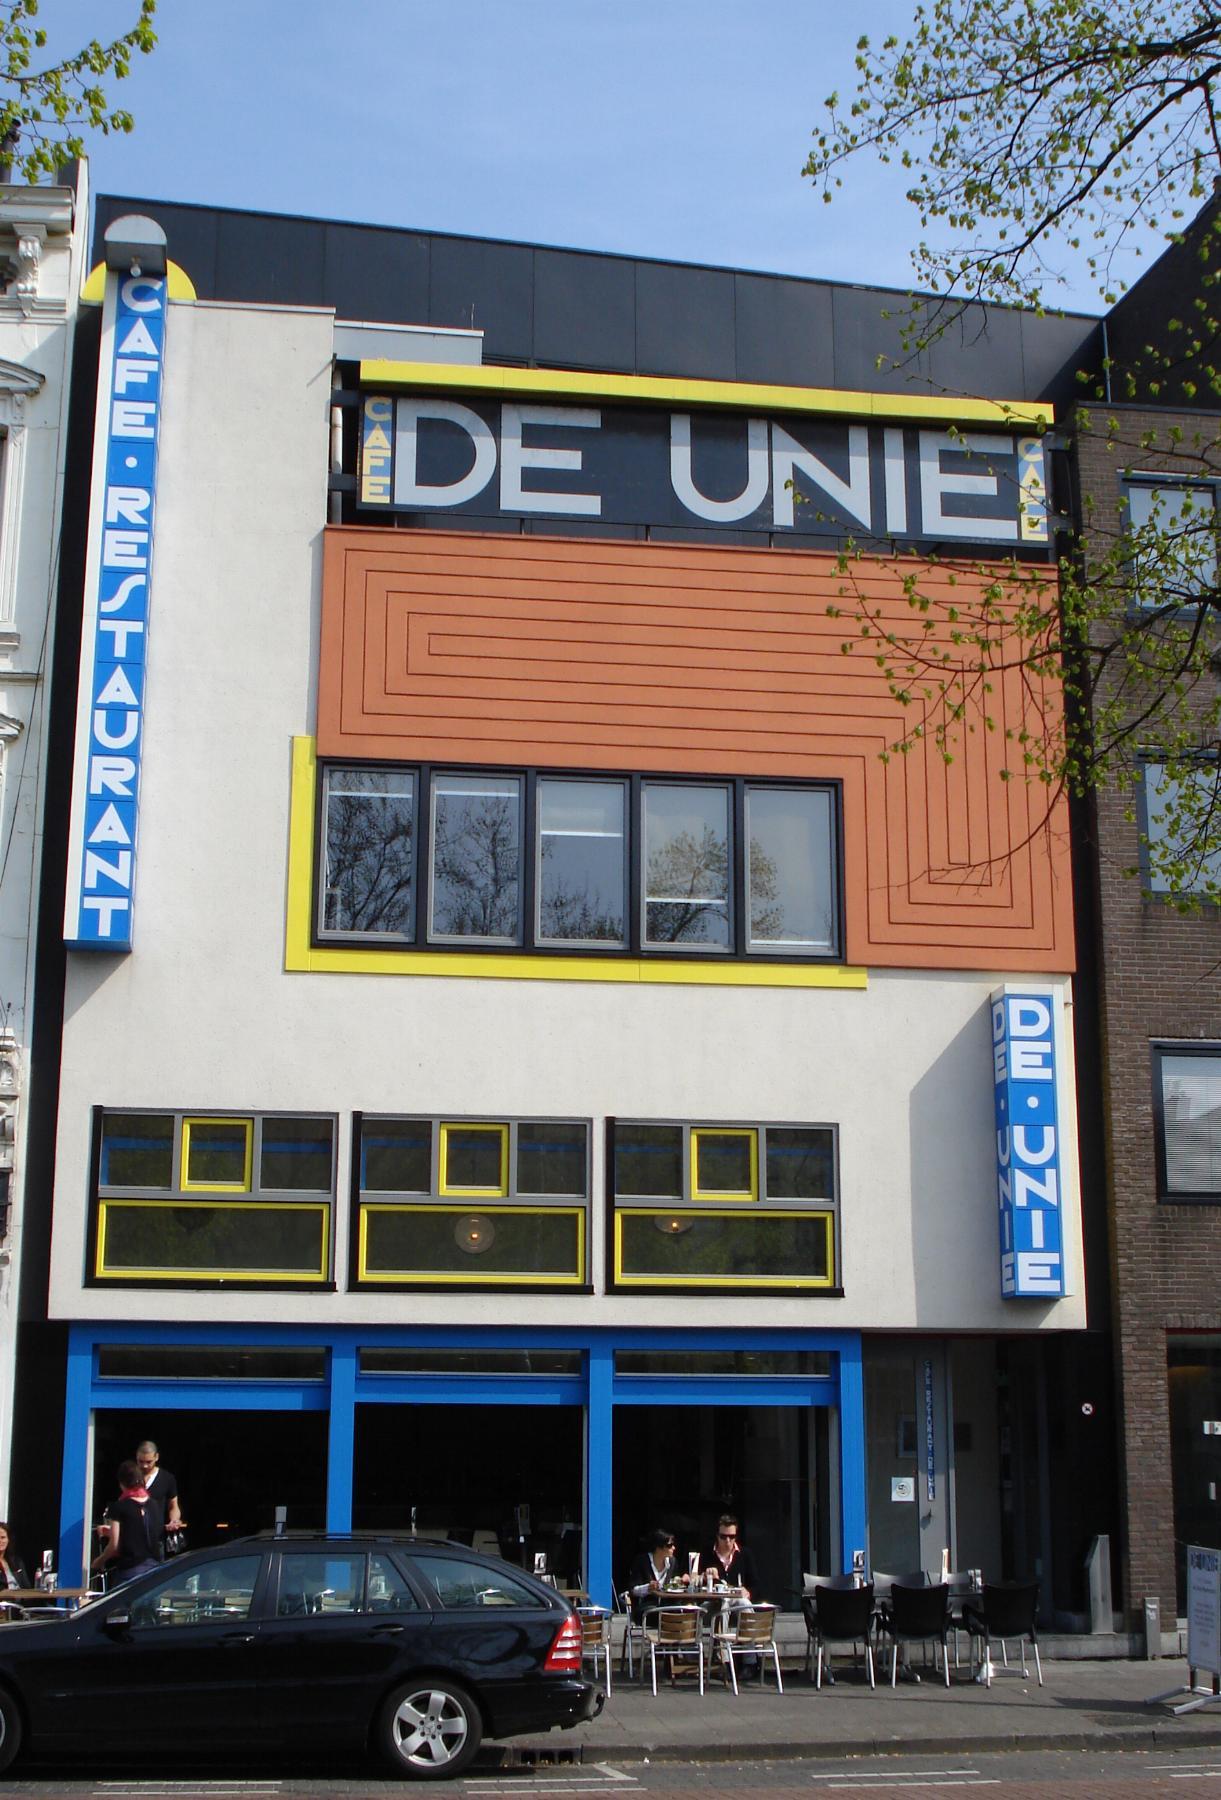 New File:Rotterdam mauritsweg de unie.jpg - Wikimedia Commons &YQ07